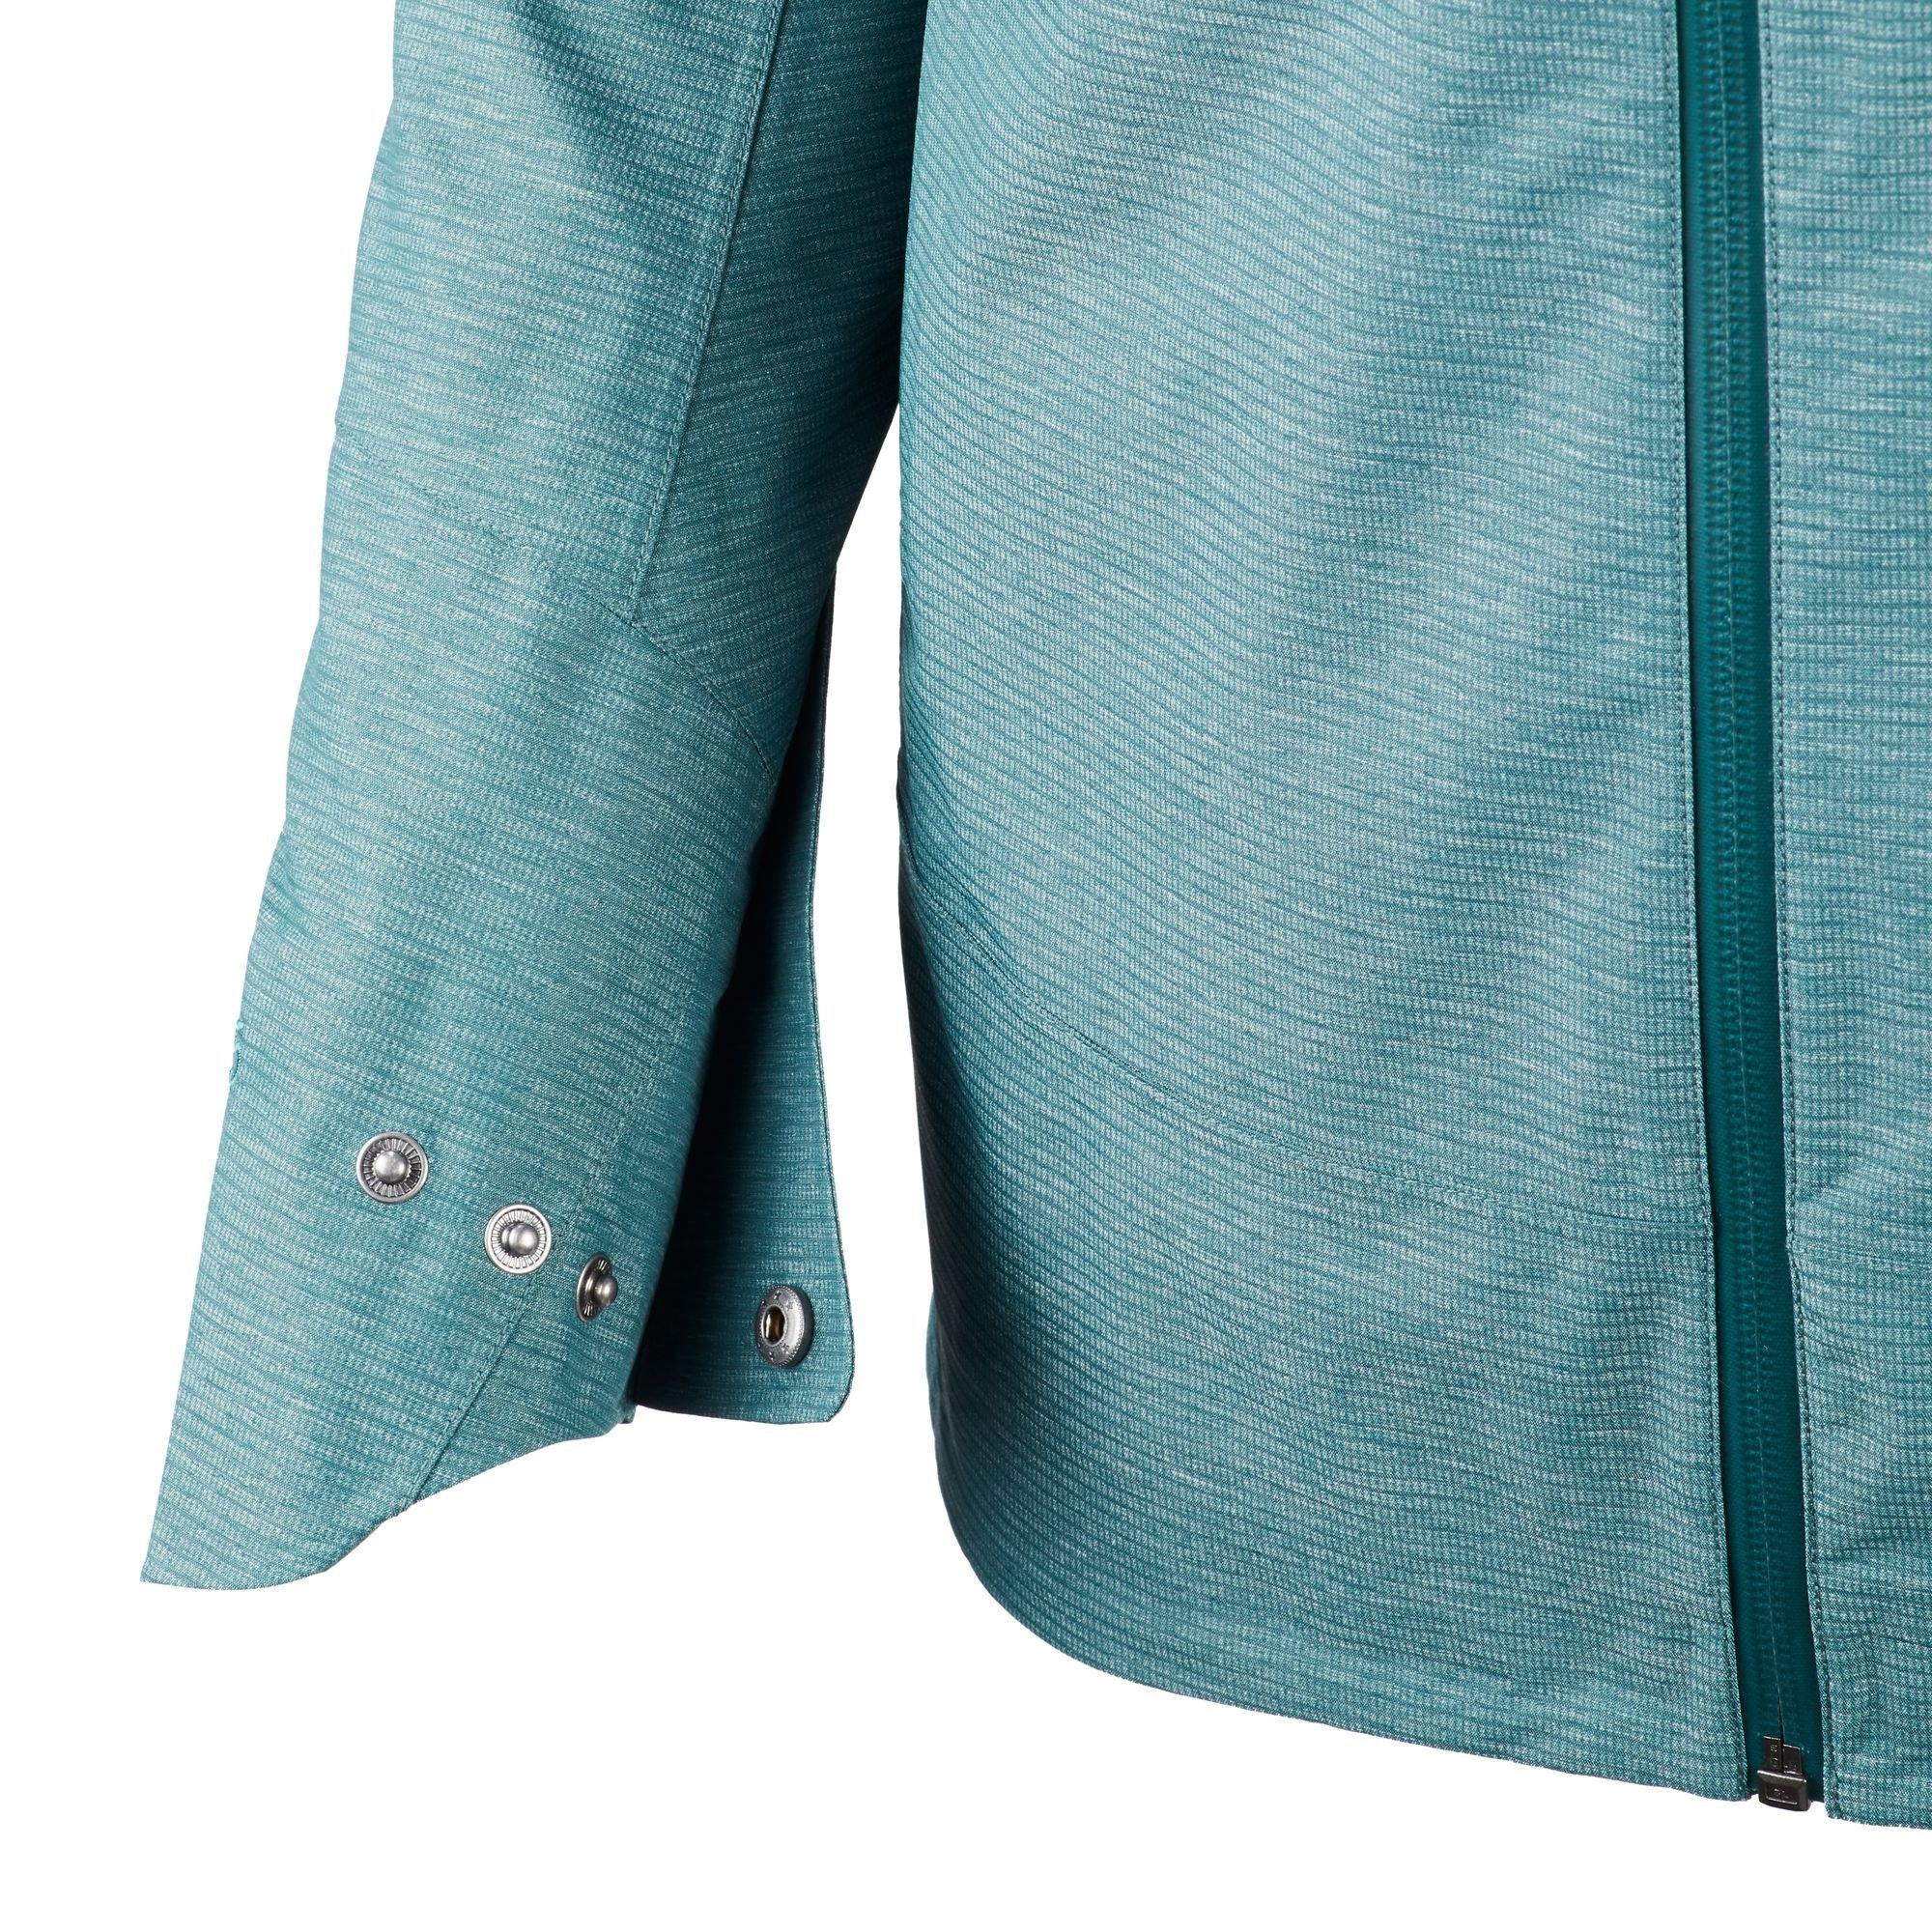 NEW-Kathmandu-Lawrence-Women-039-s-ngx-Windproof-Waterproof-Outdoor-Rain-Jacket-v2 thumbnail 17